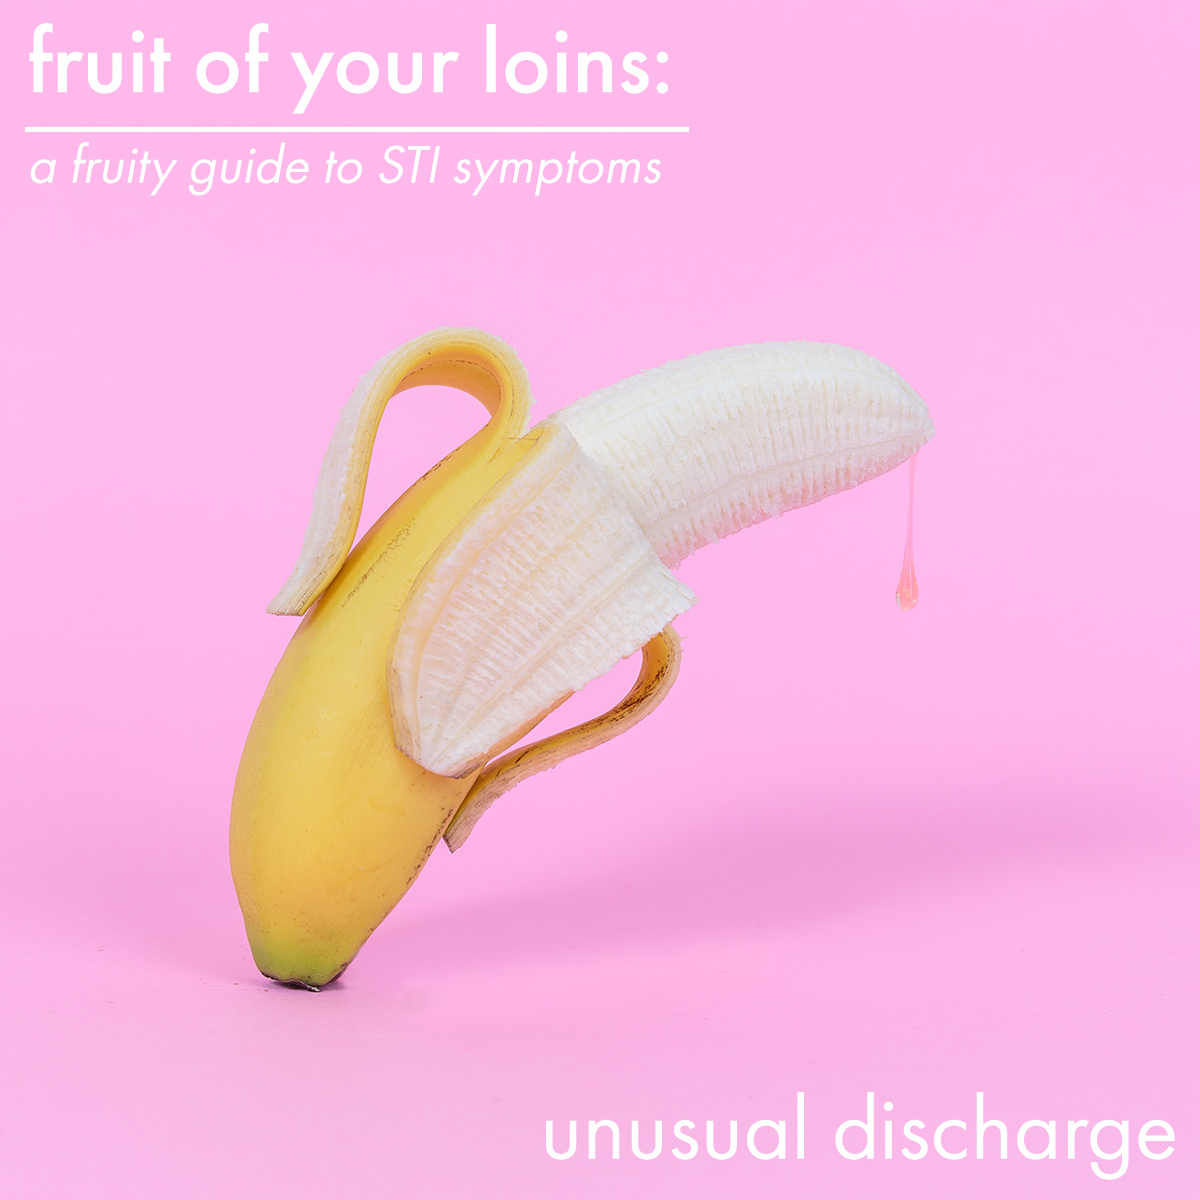 Fruit of your loins, Sti symptoms displaye don fruit - Medicine Direct Sexual Health